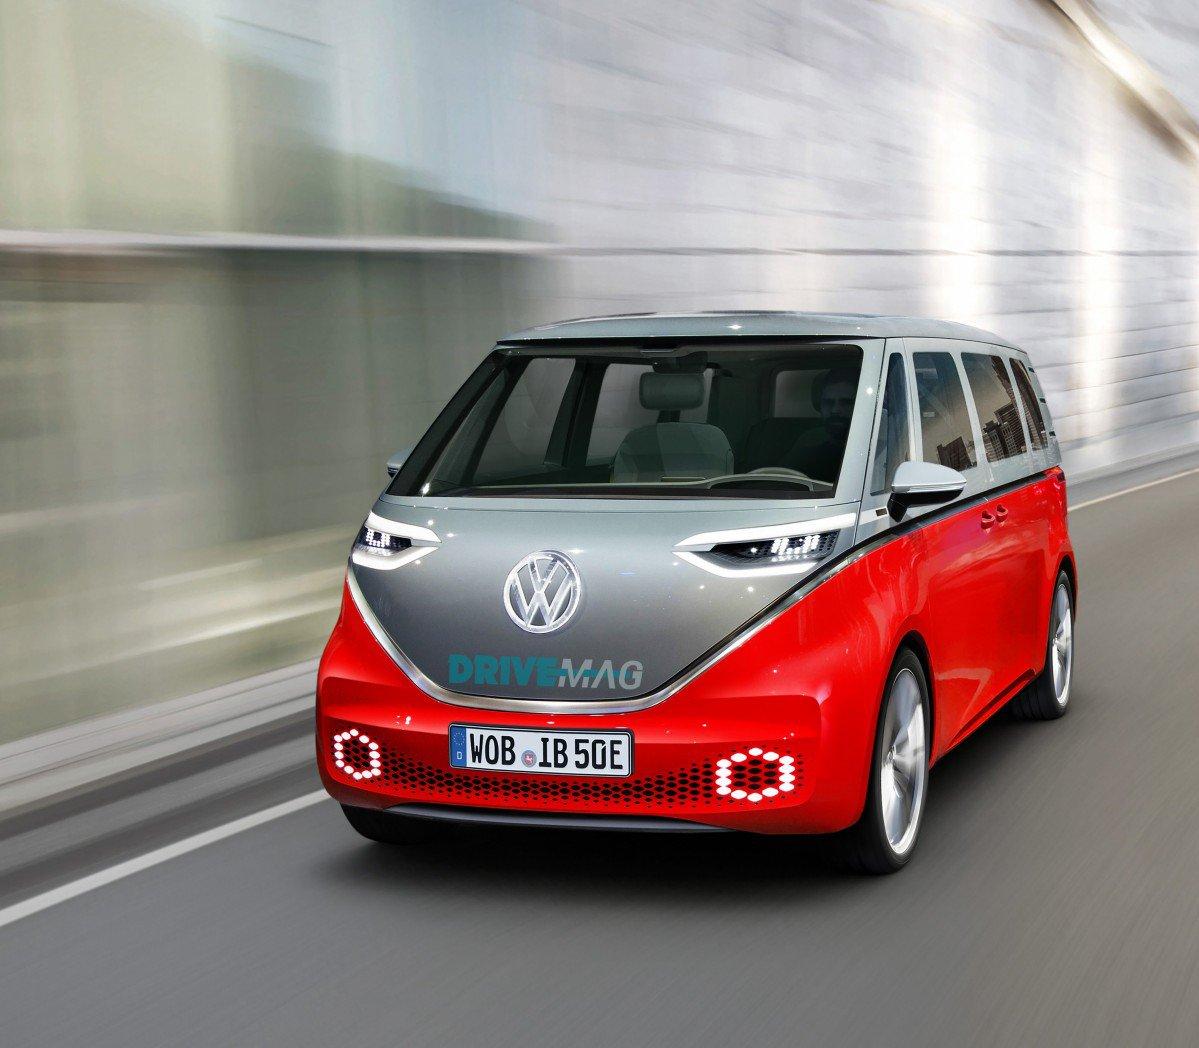 Vw E Bulli >> VW I.D. Buzz concept will turn into a production model, VW boss says